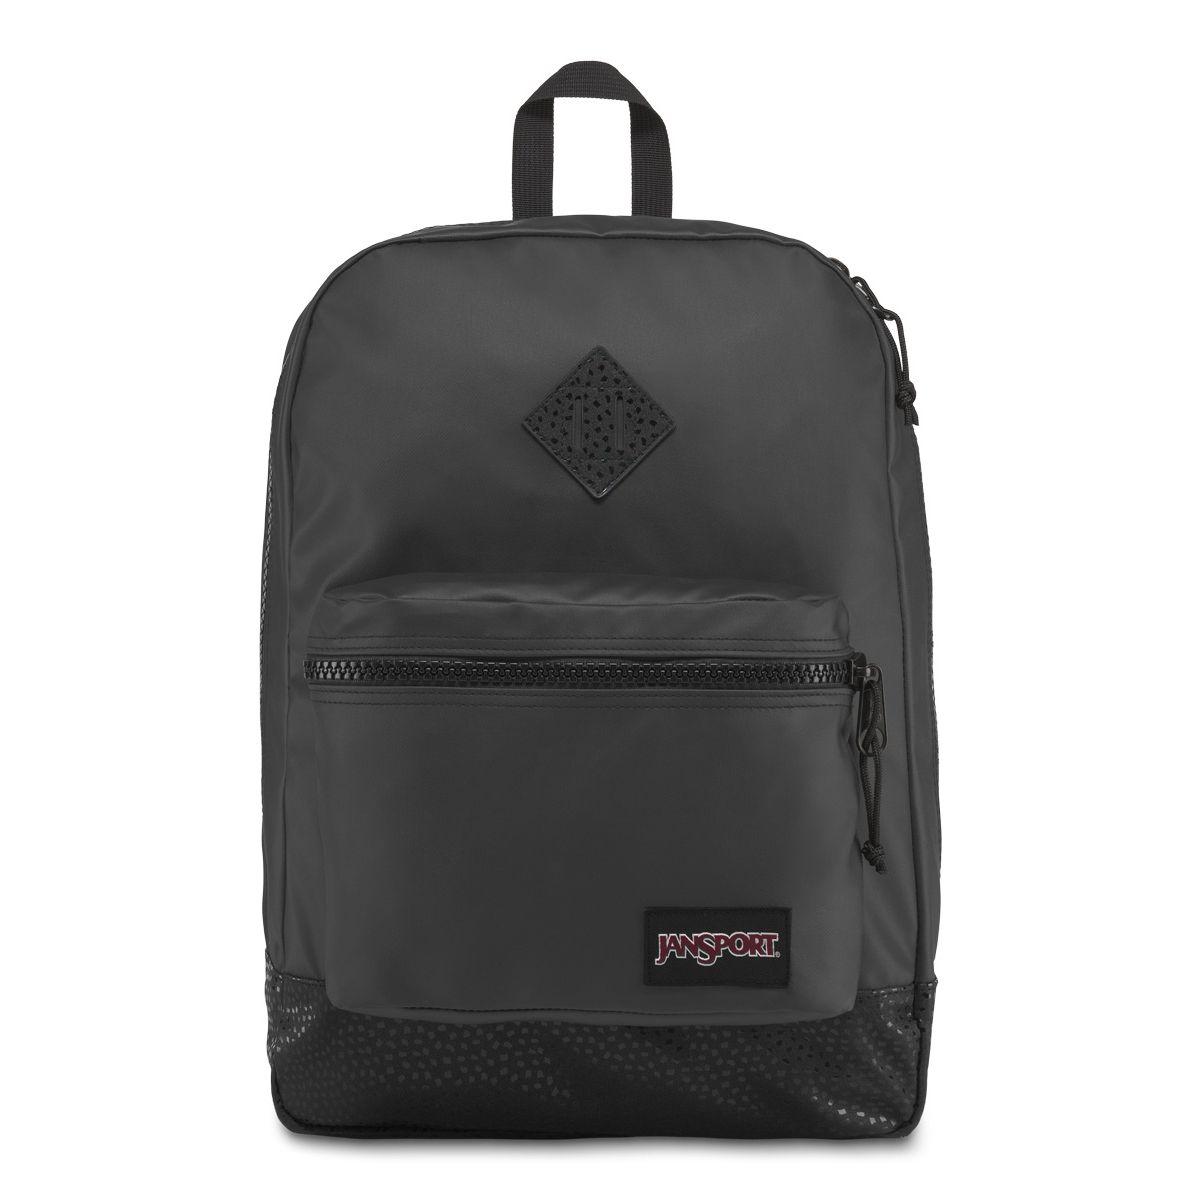 JanSport Super FX Backpack in Black Stone Iridescent